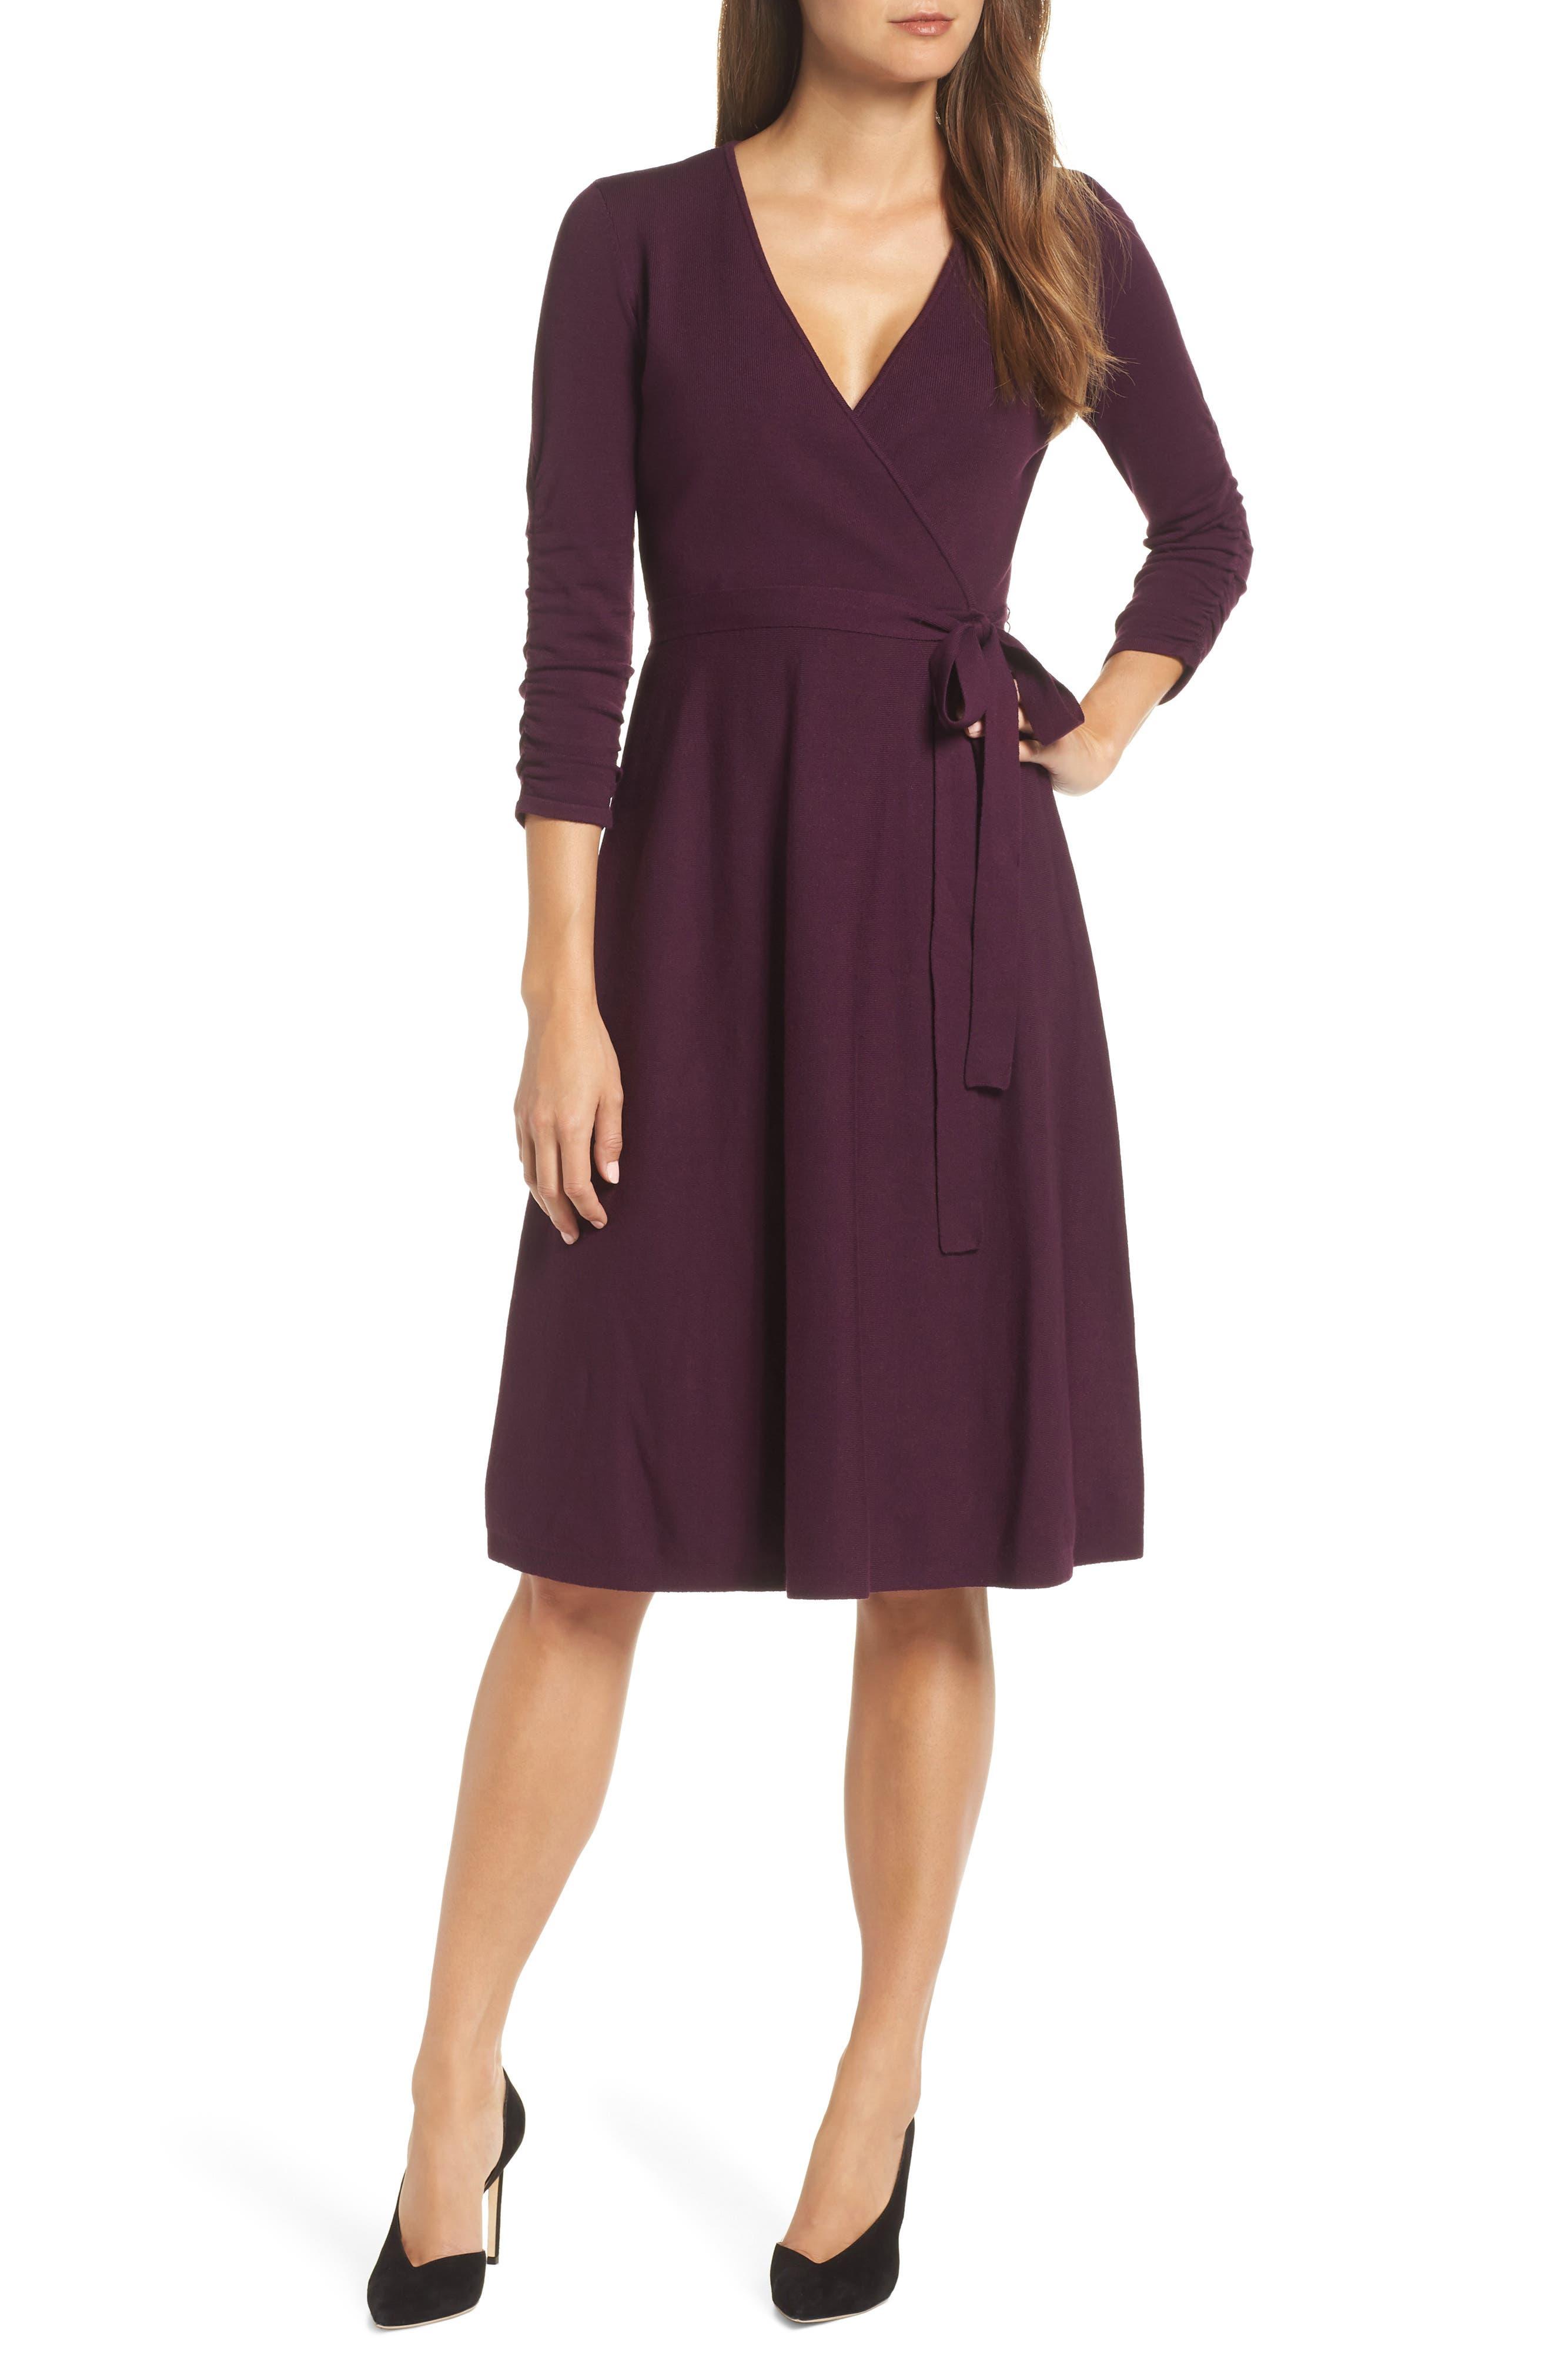 ELIZA J, Faux Wrap Sweater Dress, Main thumbnail 1, color, 930